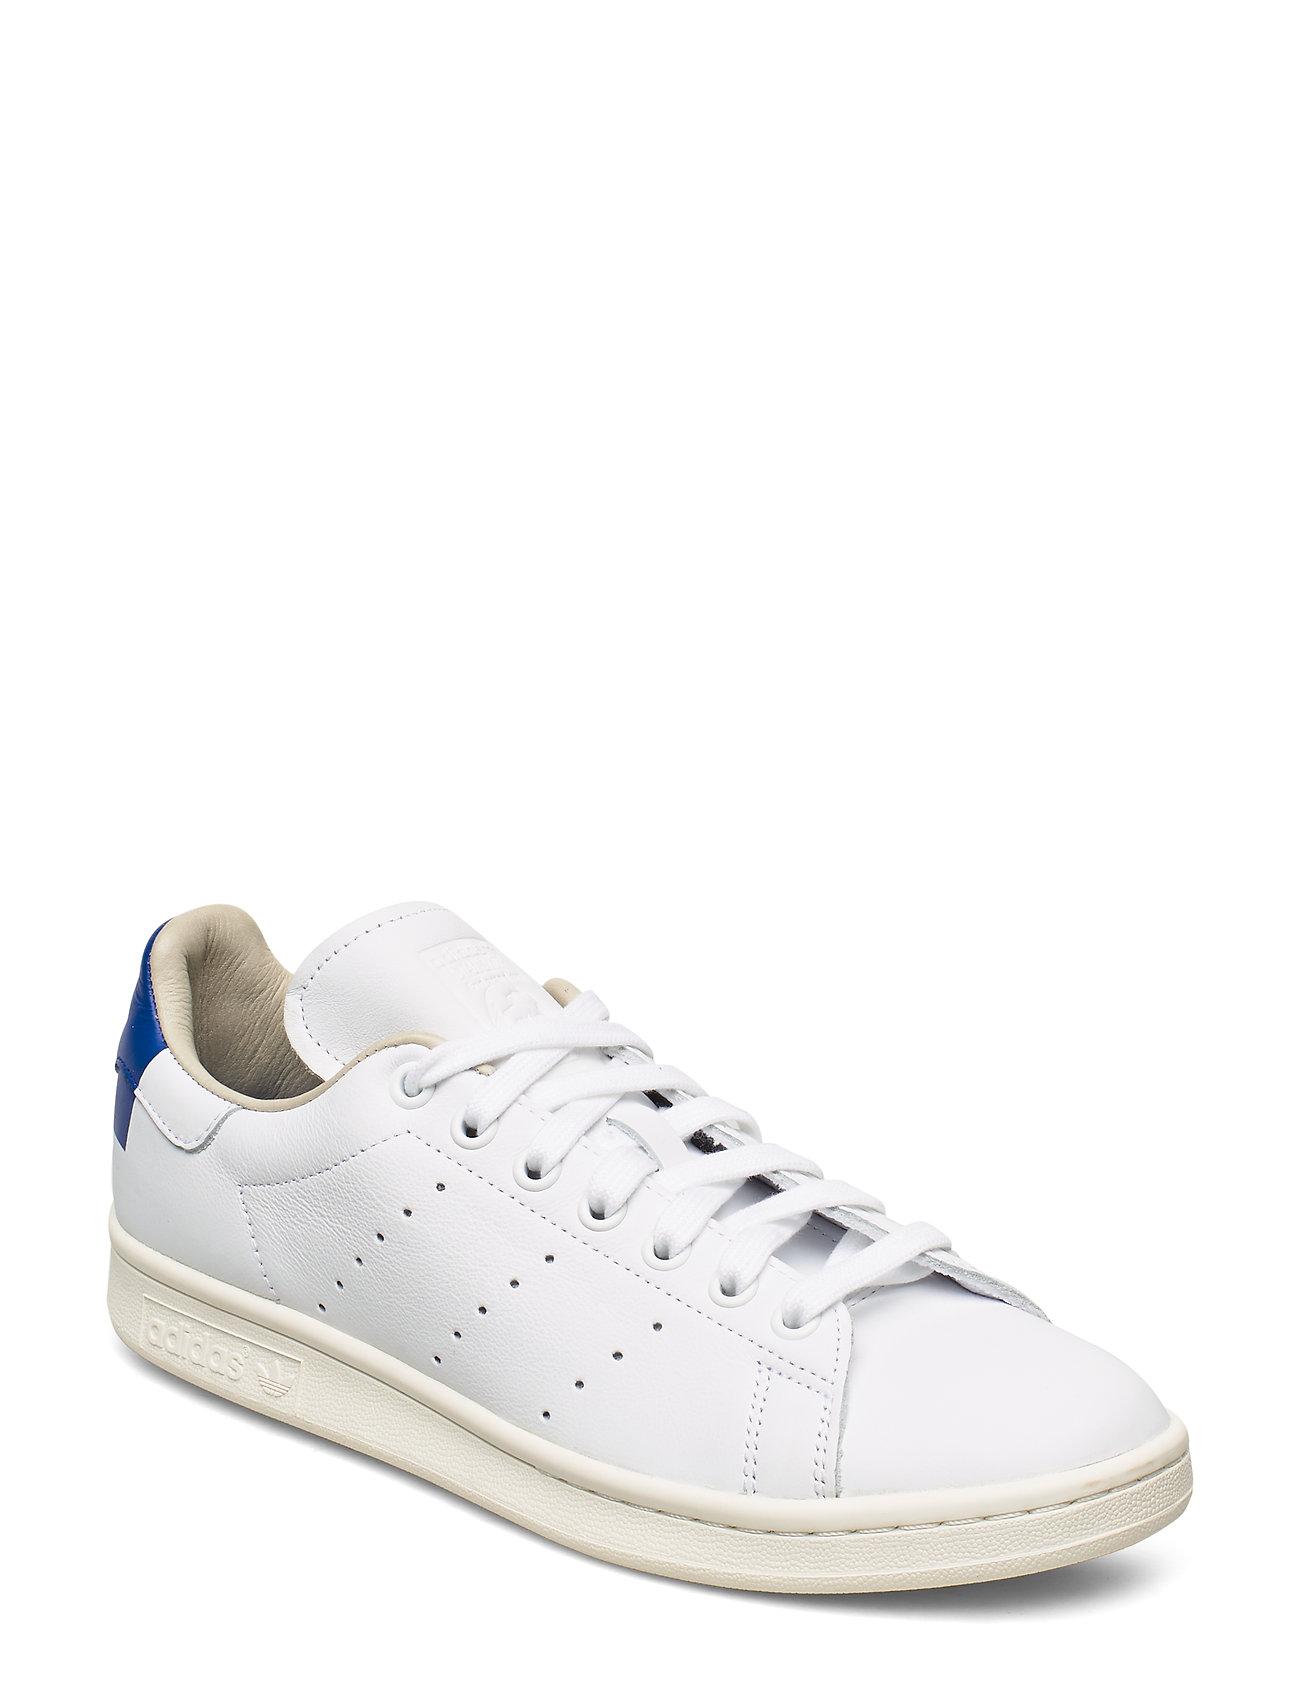 adidas Originals STAN SMITH - FTWWHT/CROYAL/OWHITE